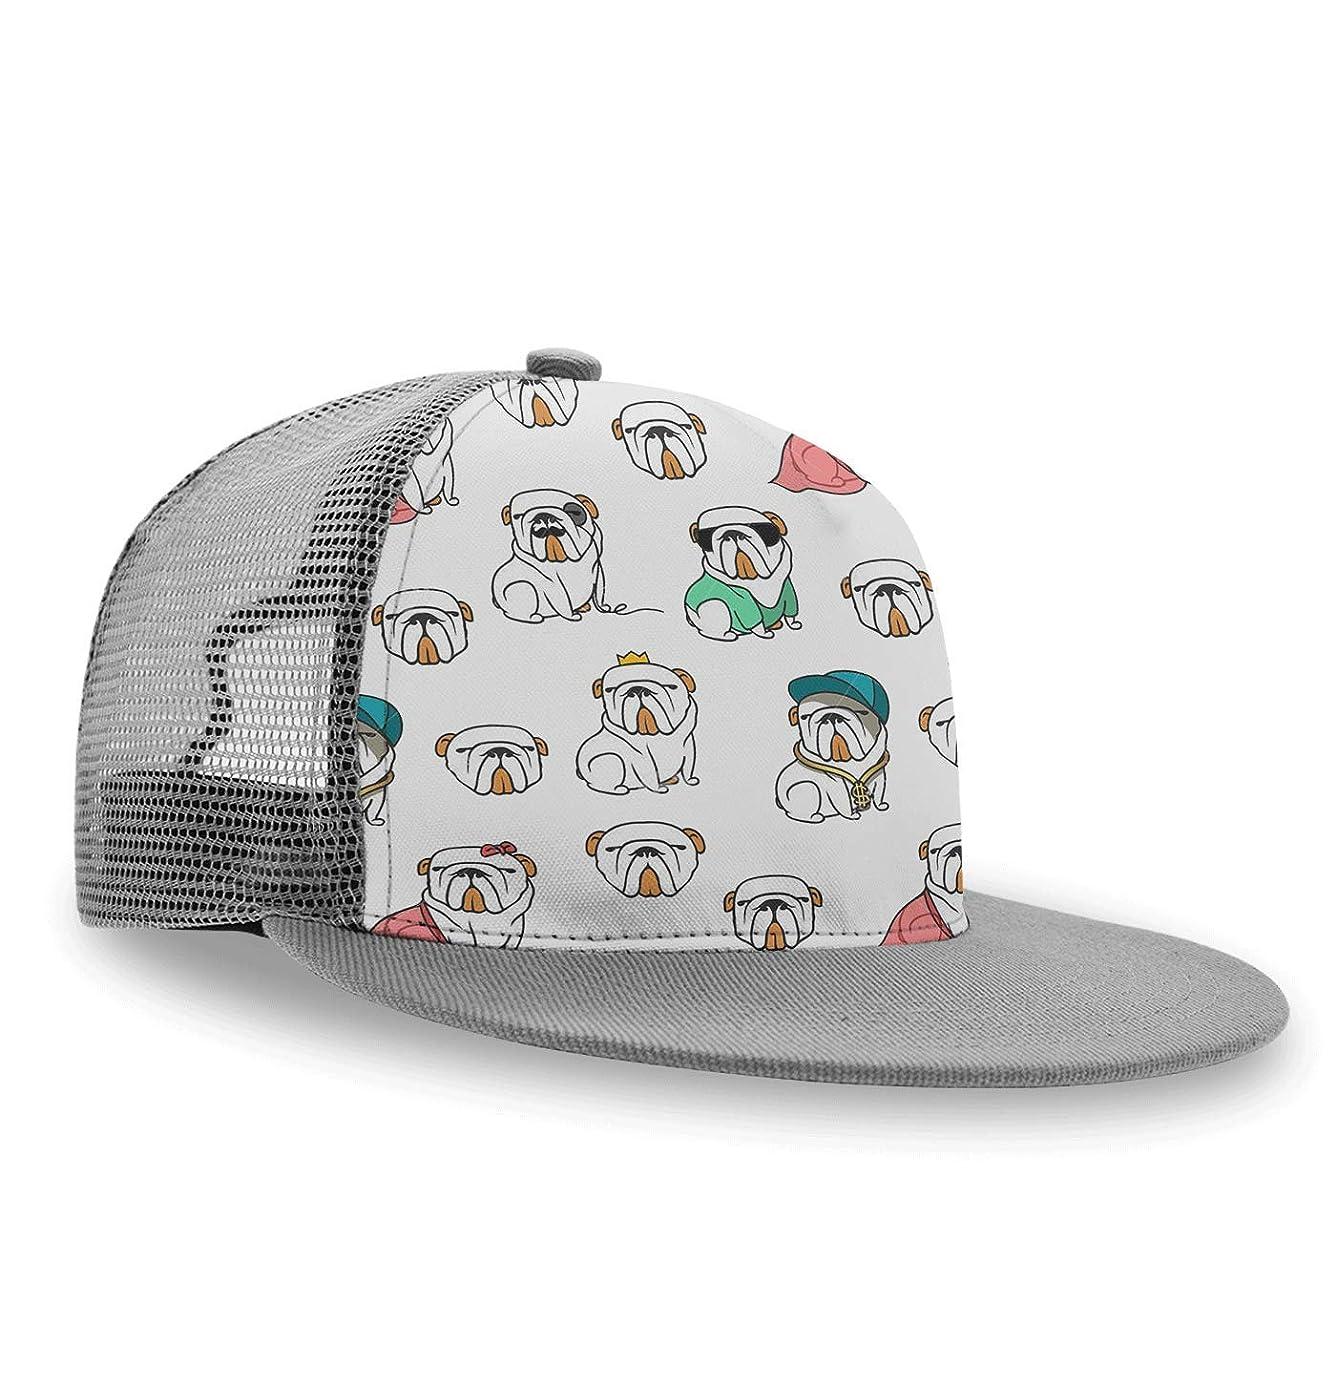 Plain Baseball Cap Hat Snapback Cap Hip-Hop Mudder Trucker Hat for Baseball Golf